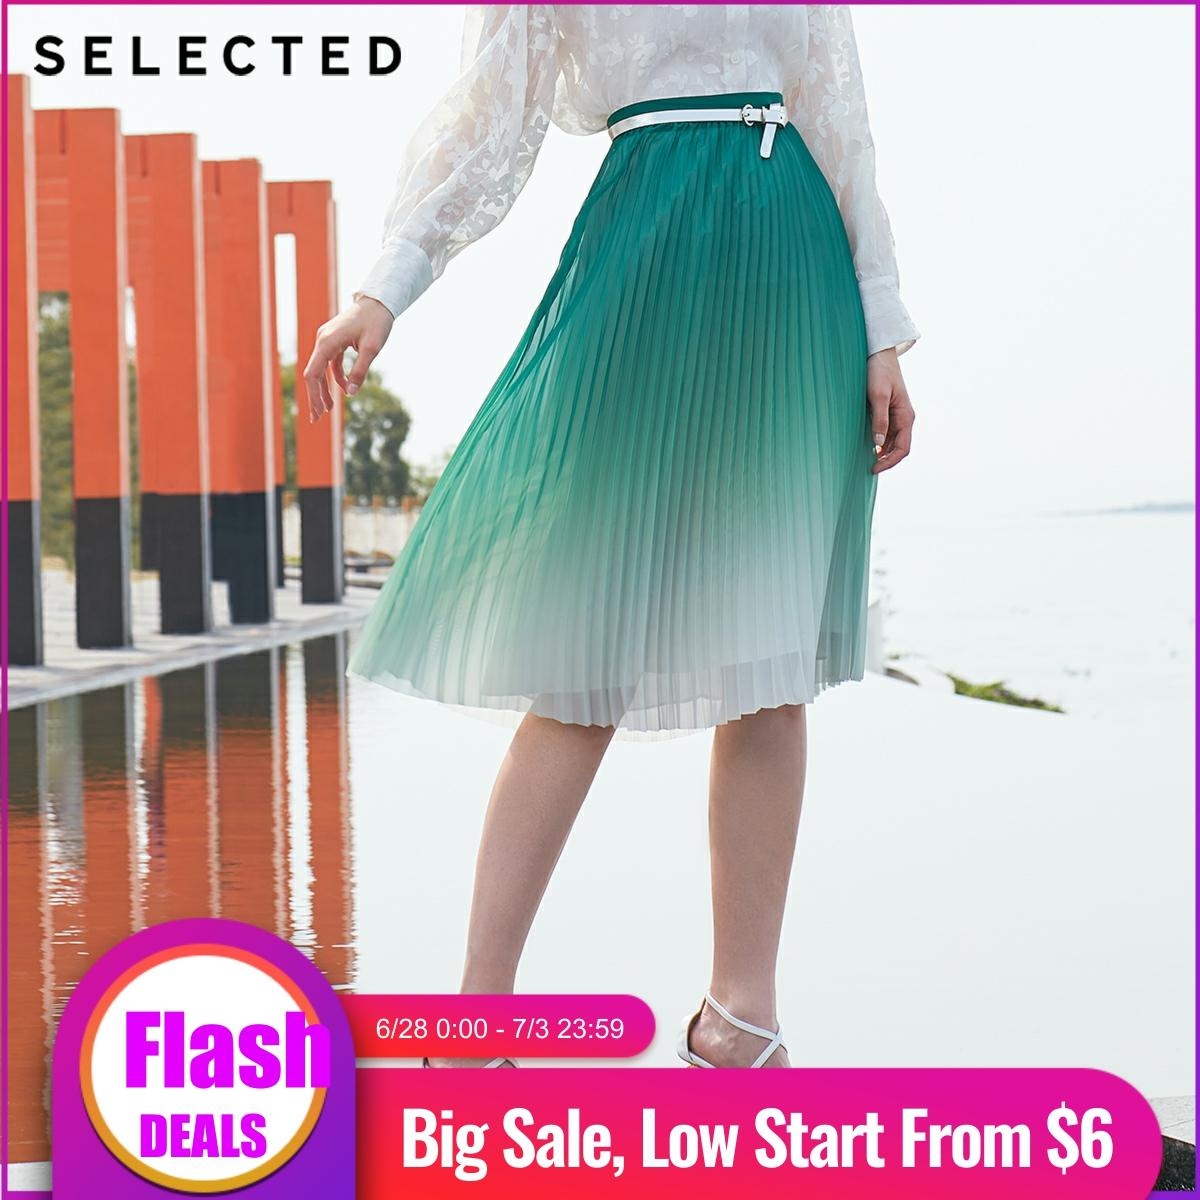 SELECTED Women's Mid-length Gradient Pleated Skirt S|41924C509